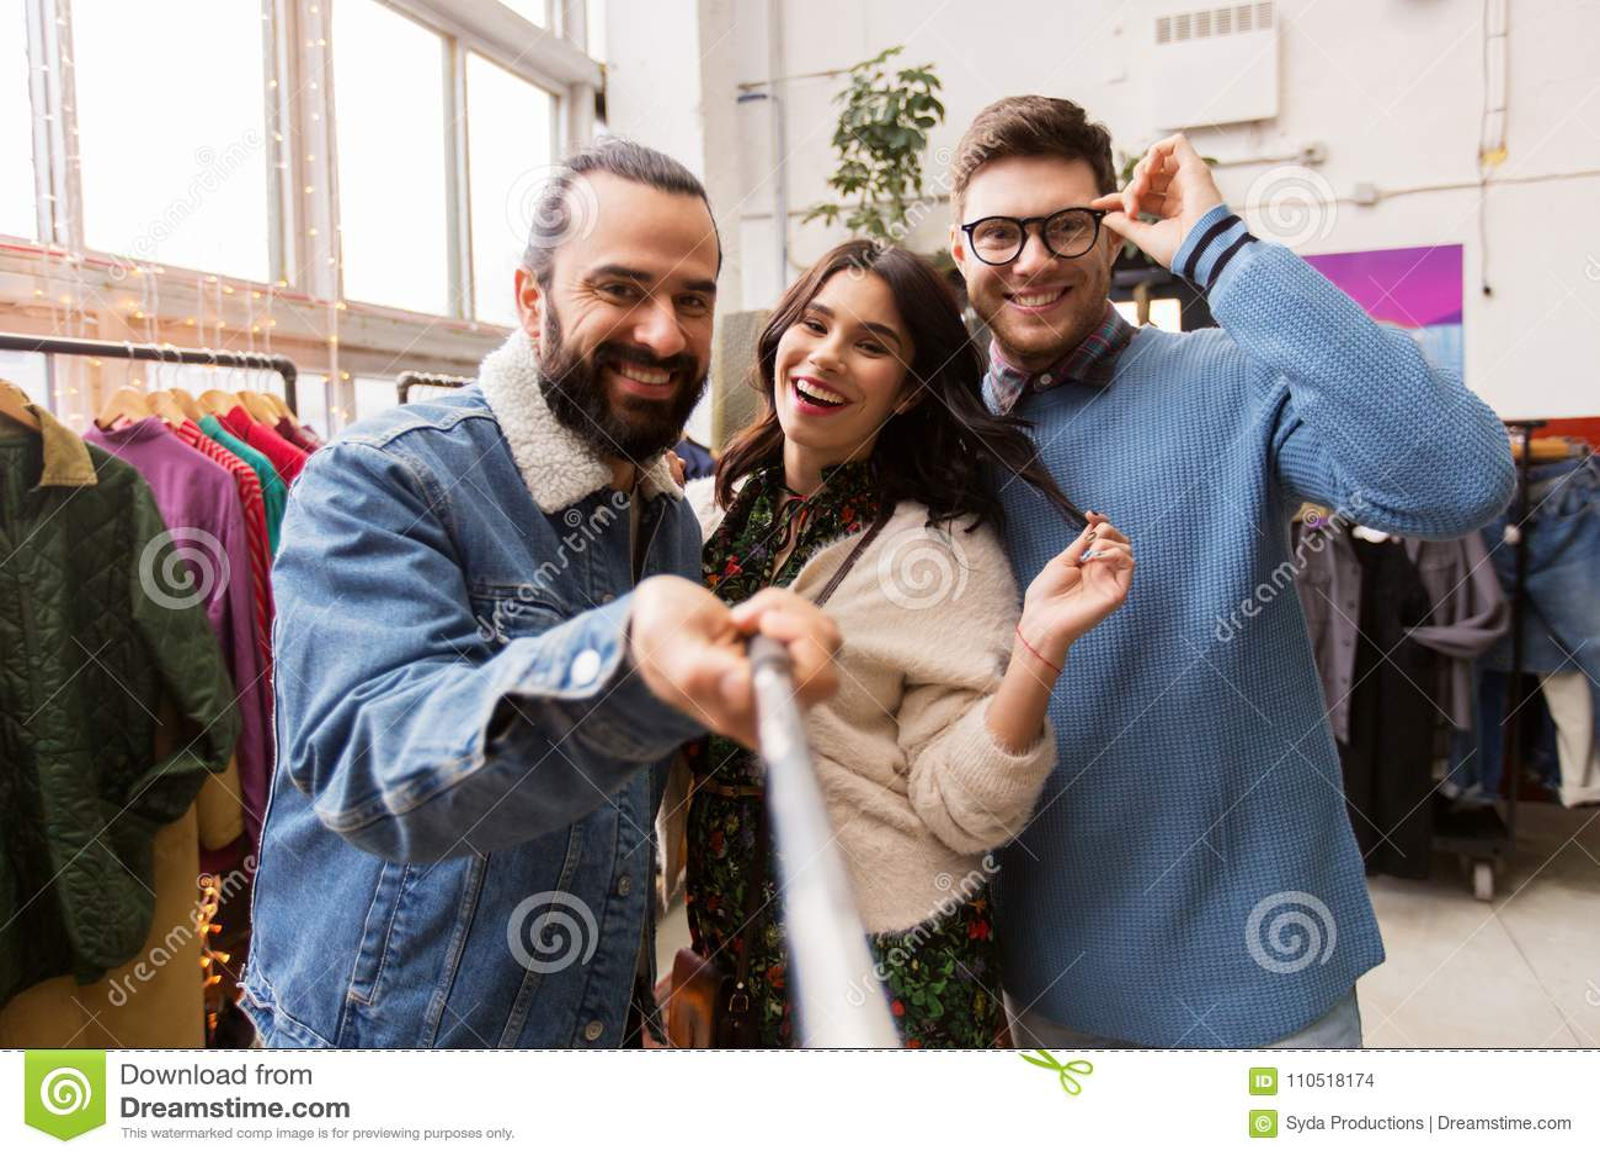 Friends taking selfie at vintage clothing store